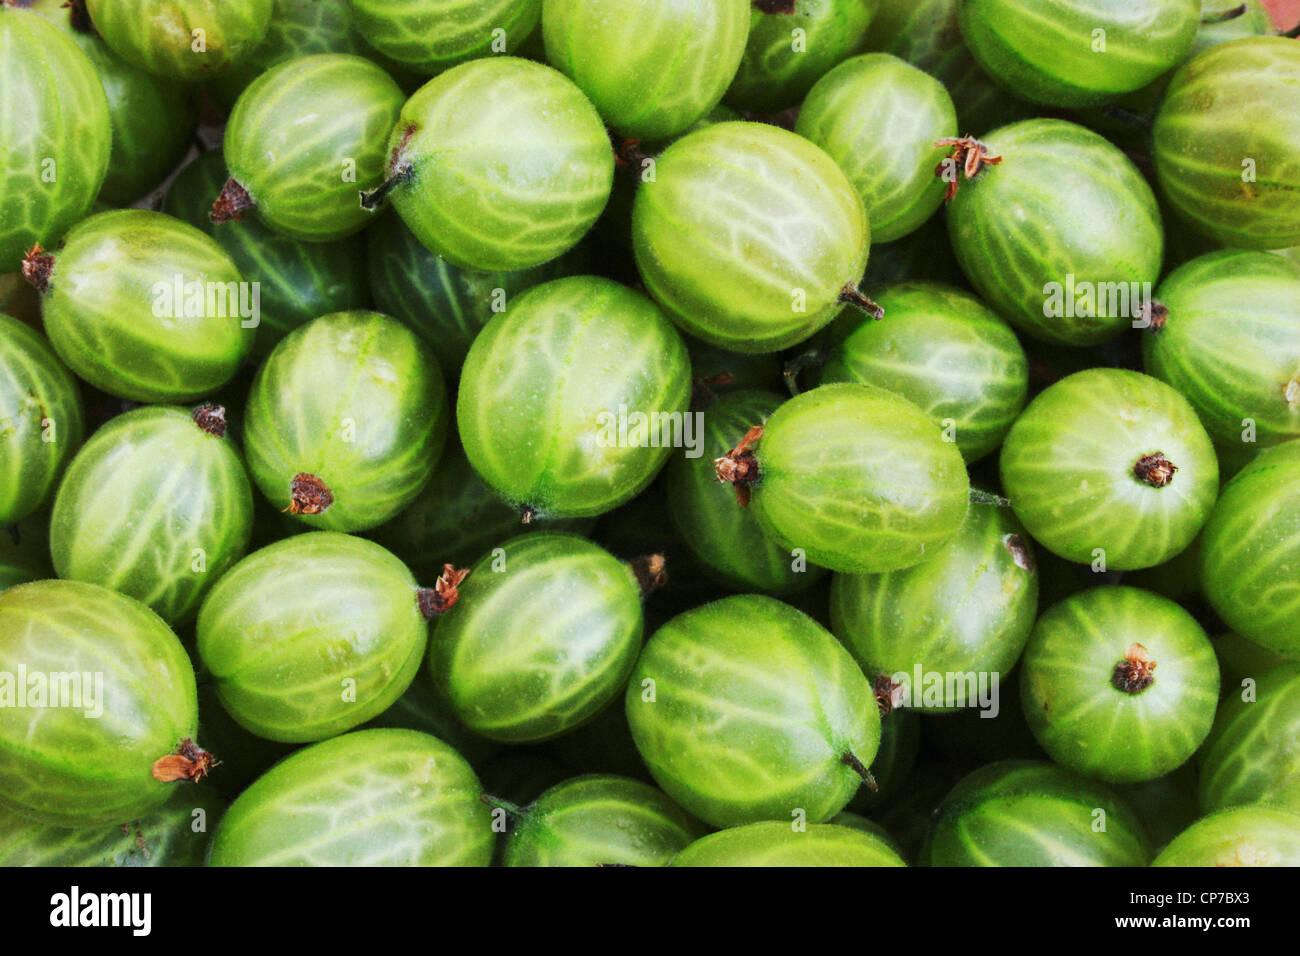 Ribes uva-crispa, Gooseberry, Green, Green. - Stock Image